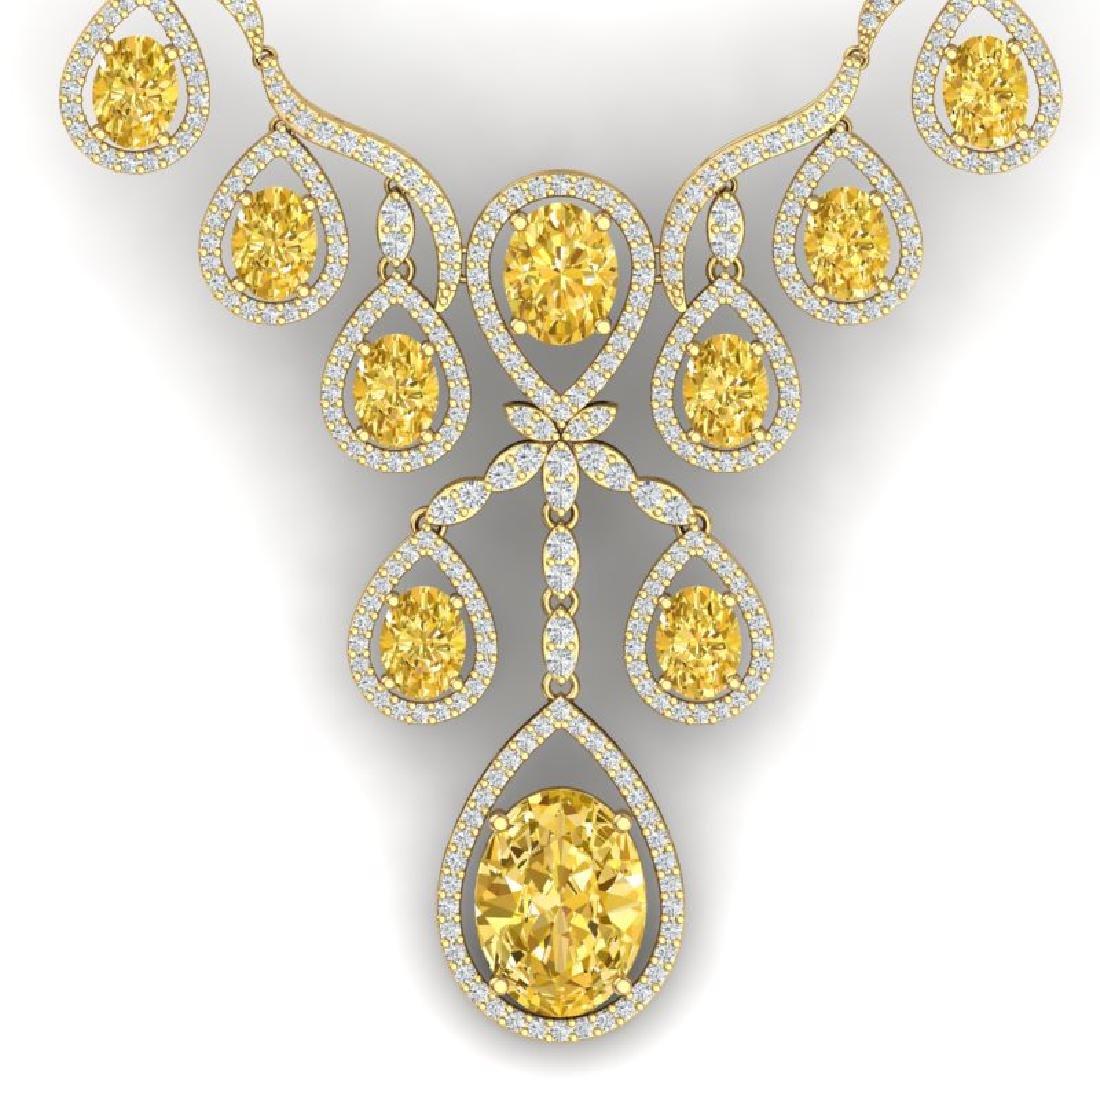 36.51 CTW Royalty Canary Citrine & VS Diamond Necklace